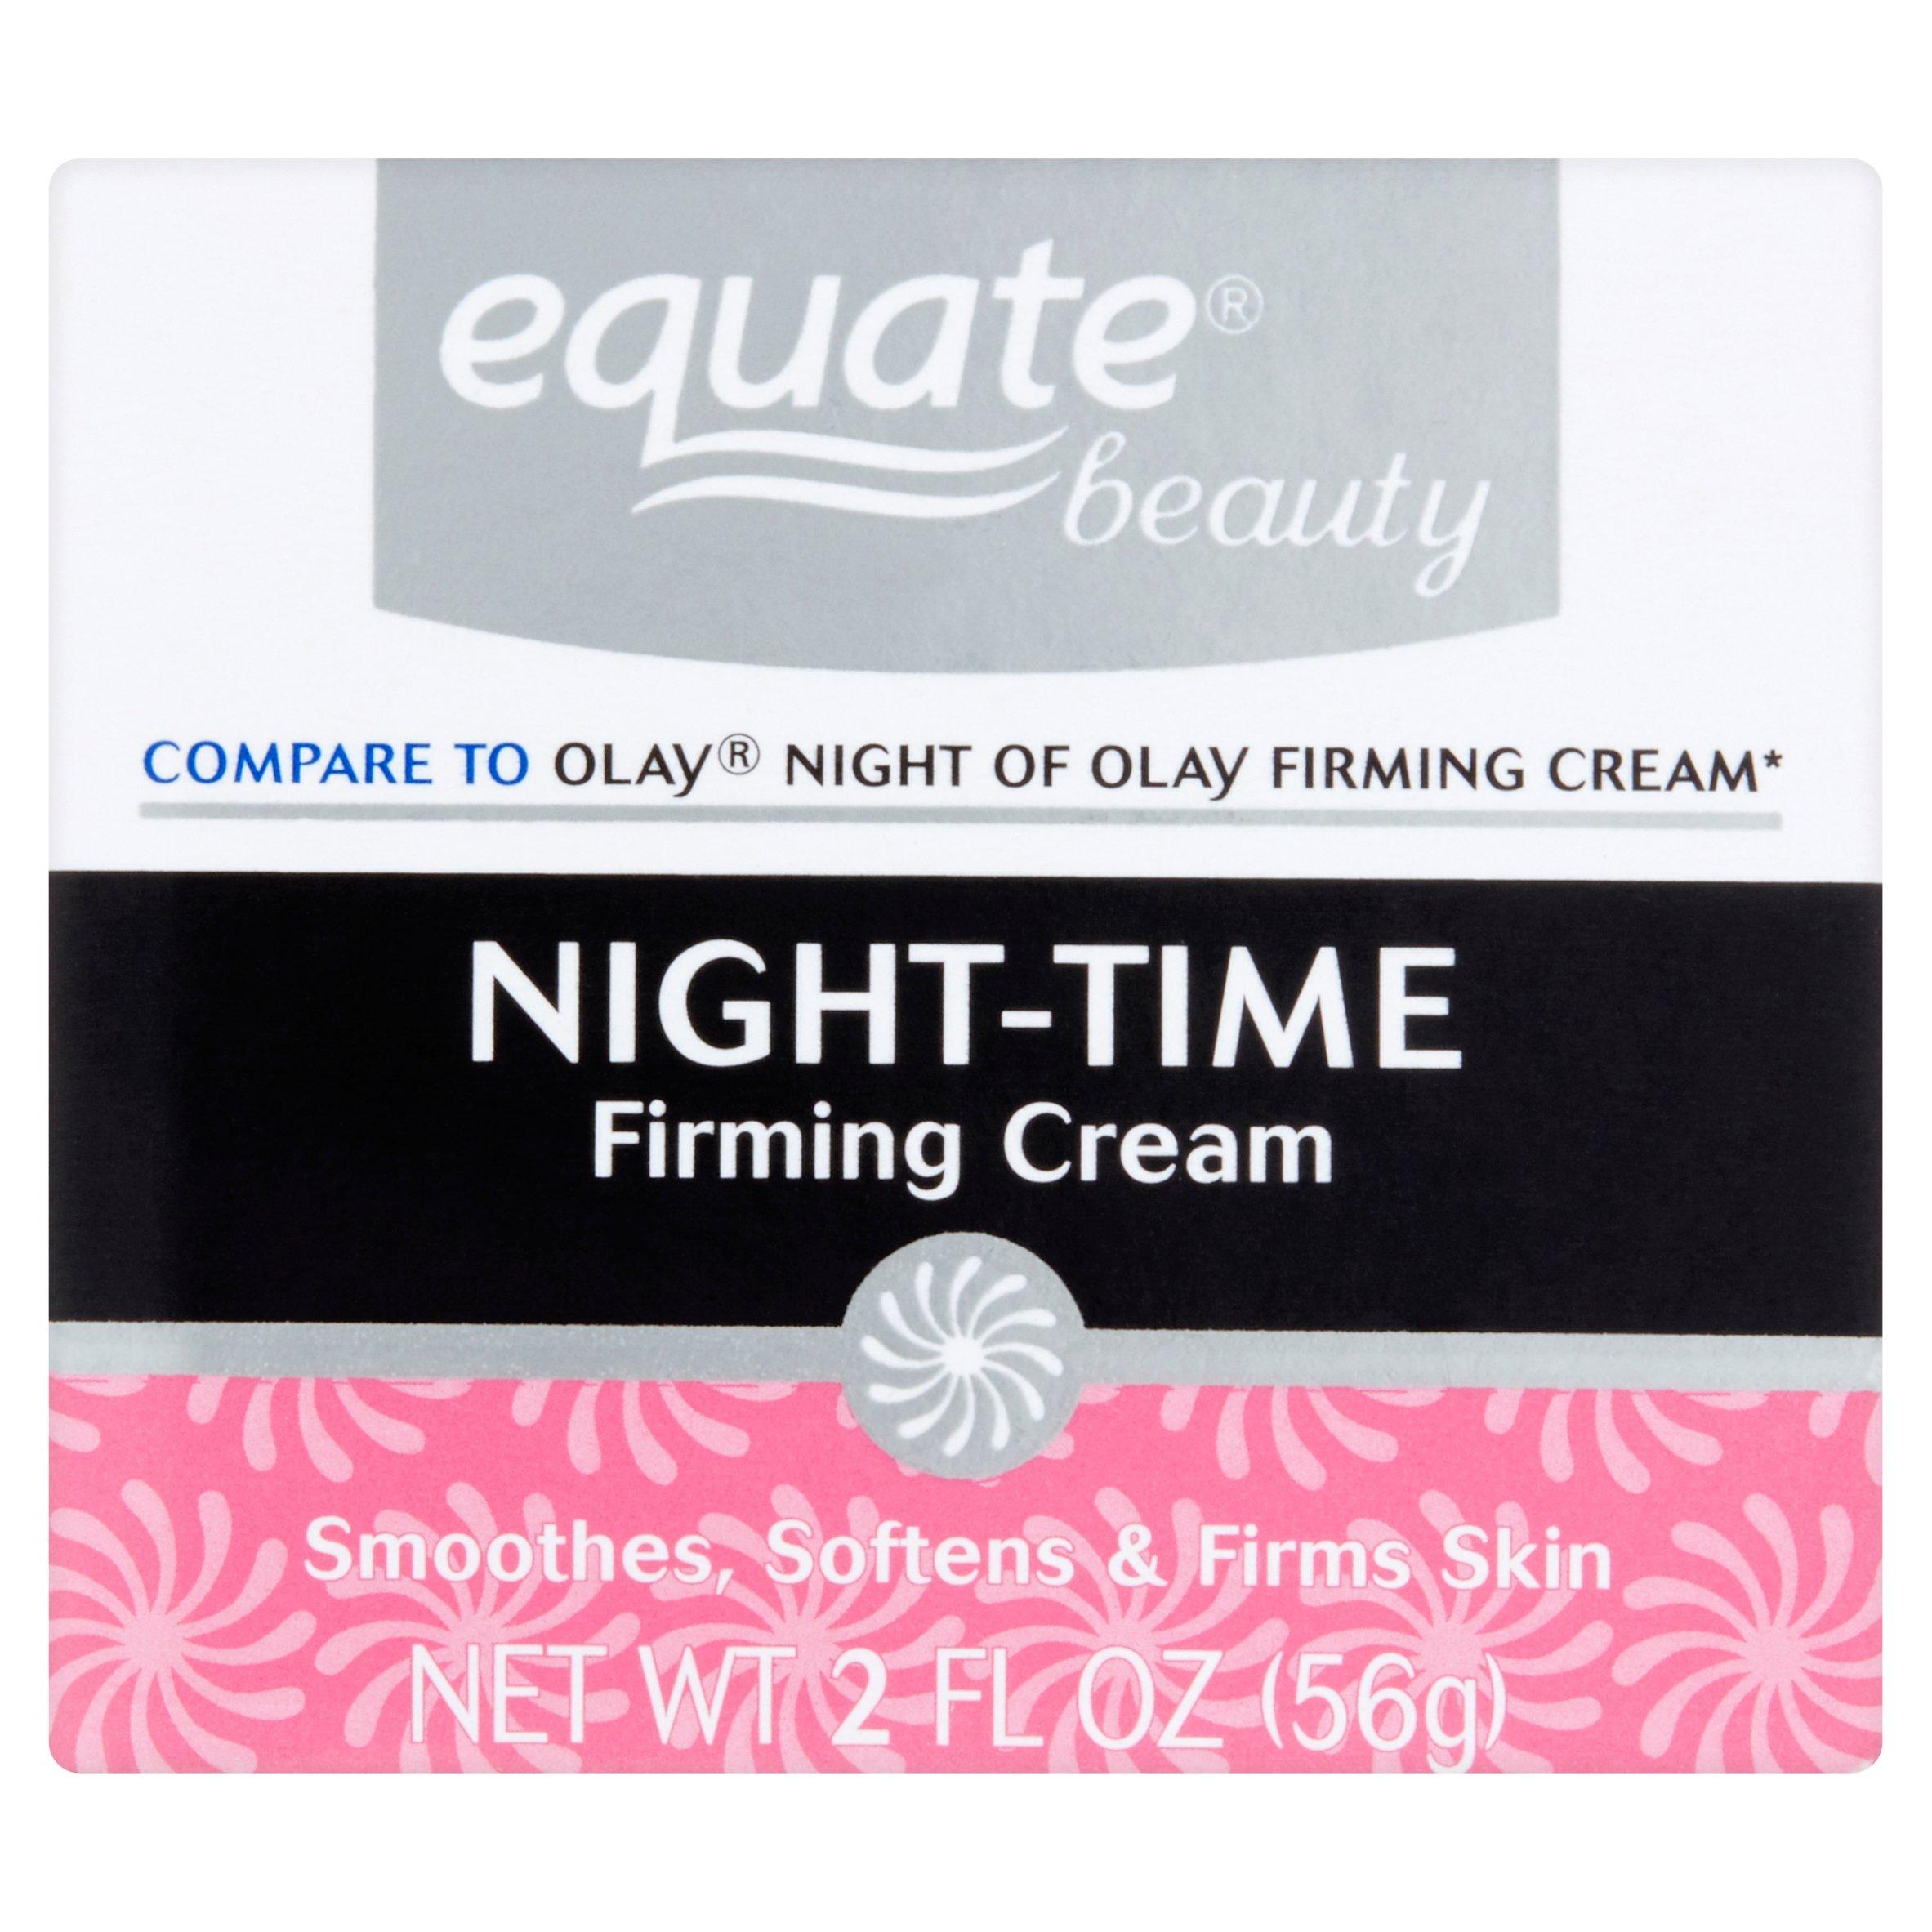 Equate Firming Night Cream Face Moisturizer, 2 Oz